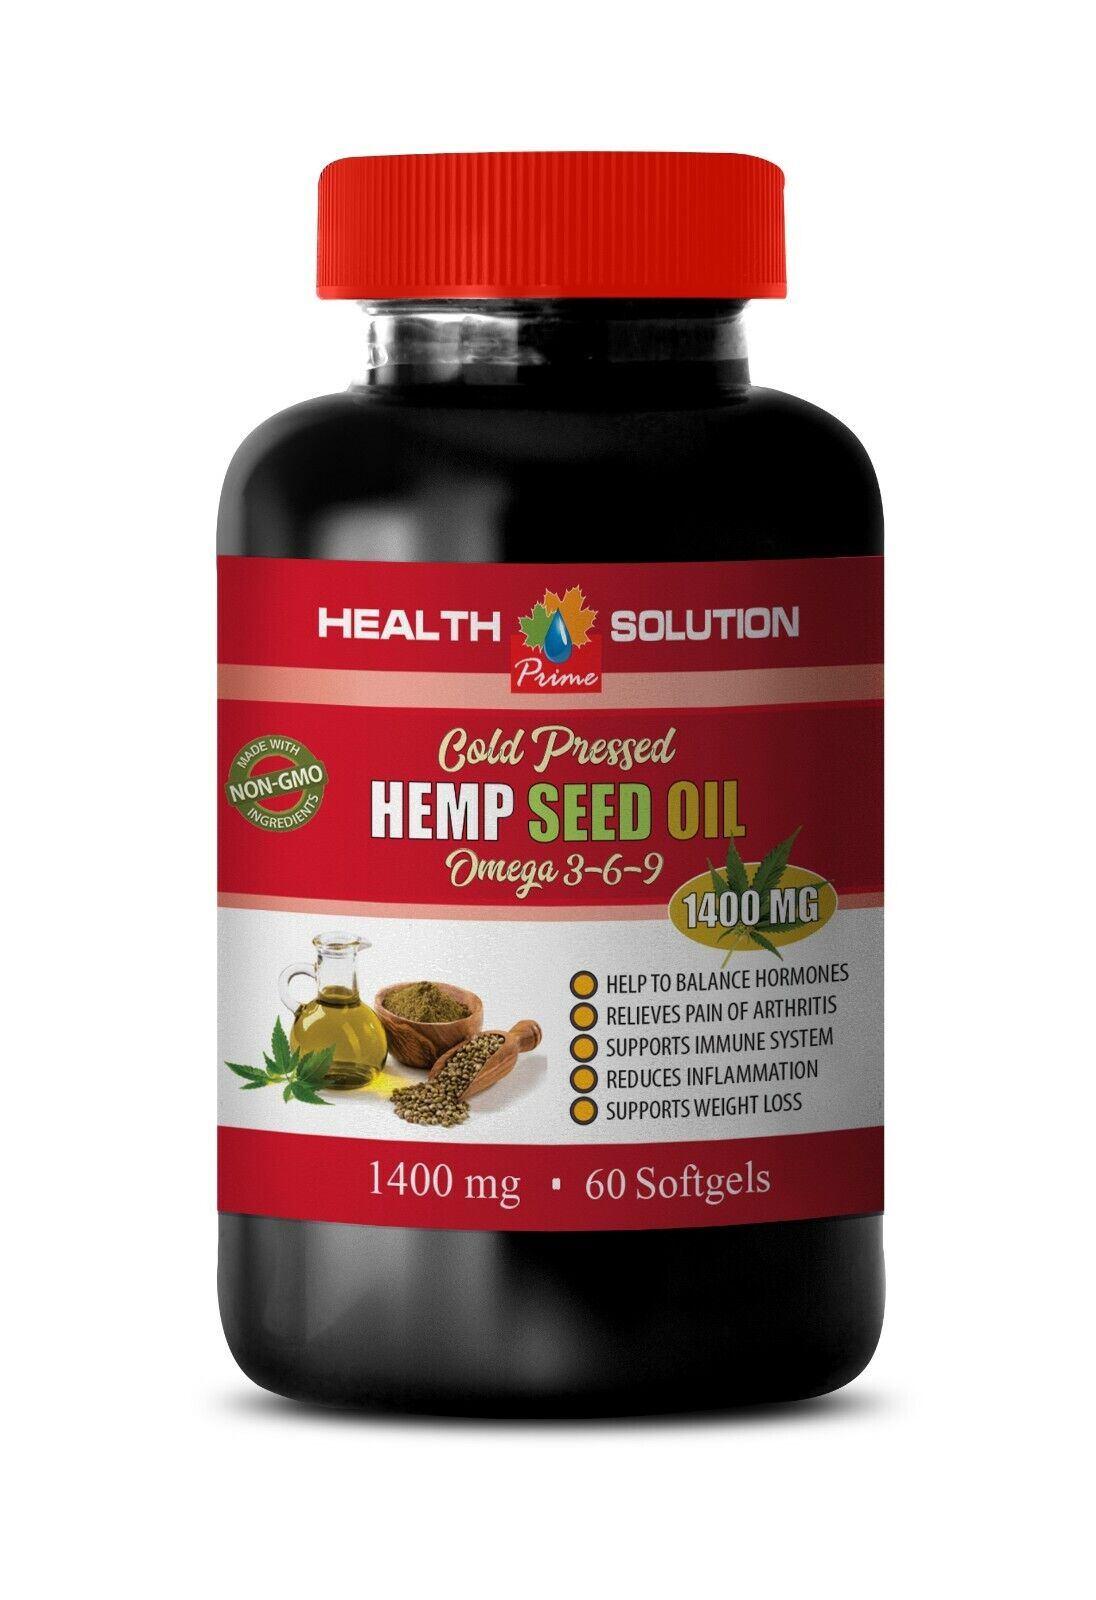 hemp oil - ORGANIC HEMP SEED OIL 1400MG 1B- pain relief supplement natural